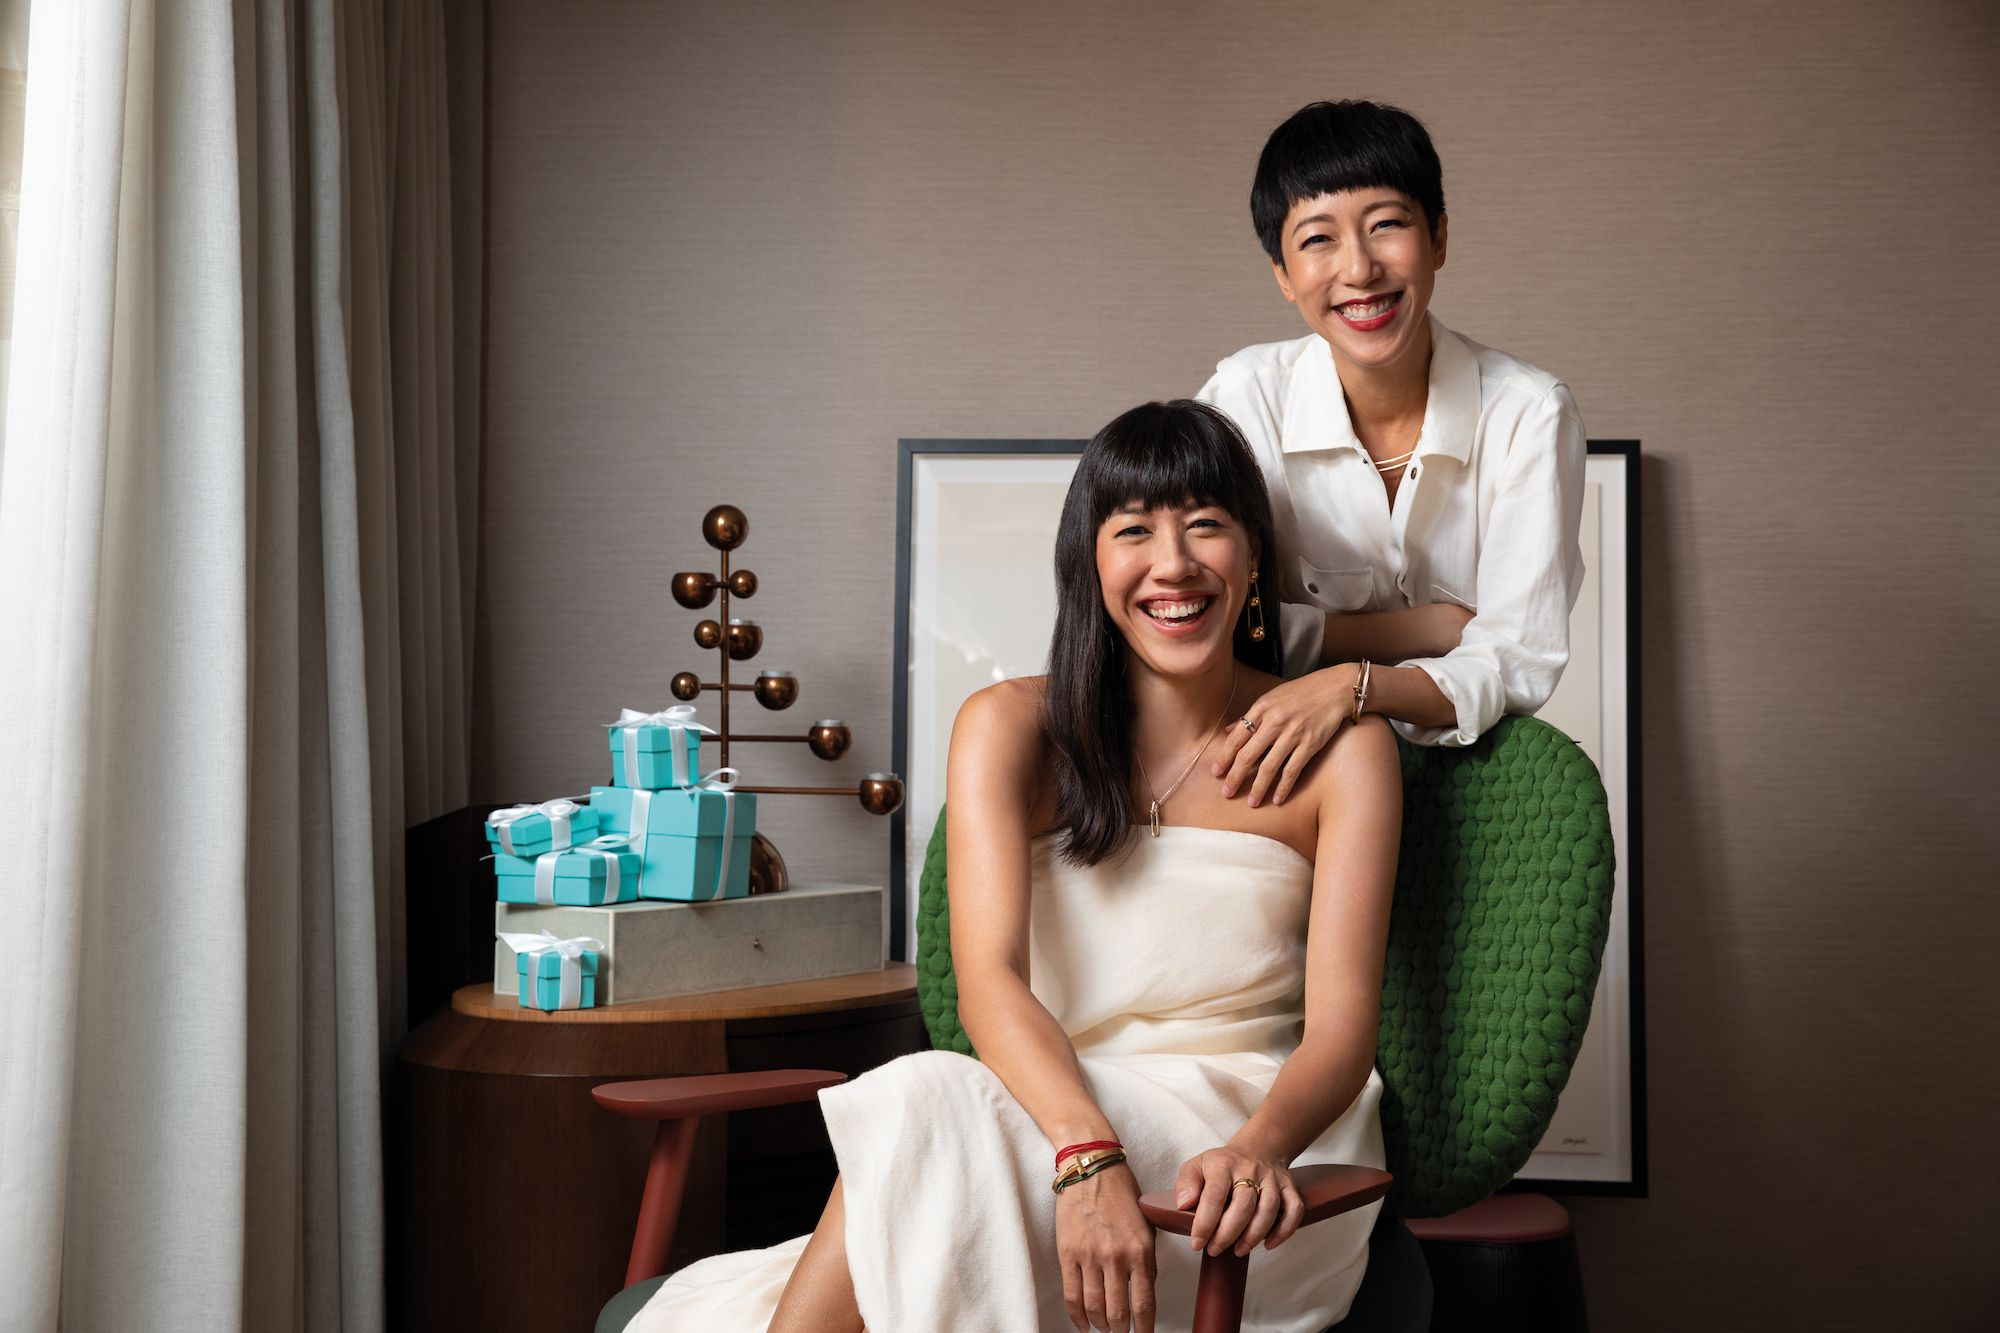 Tiffany & Co.'s T1 Jewellery Celebrates Individuality And Sisterhood